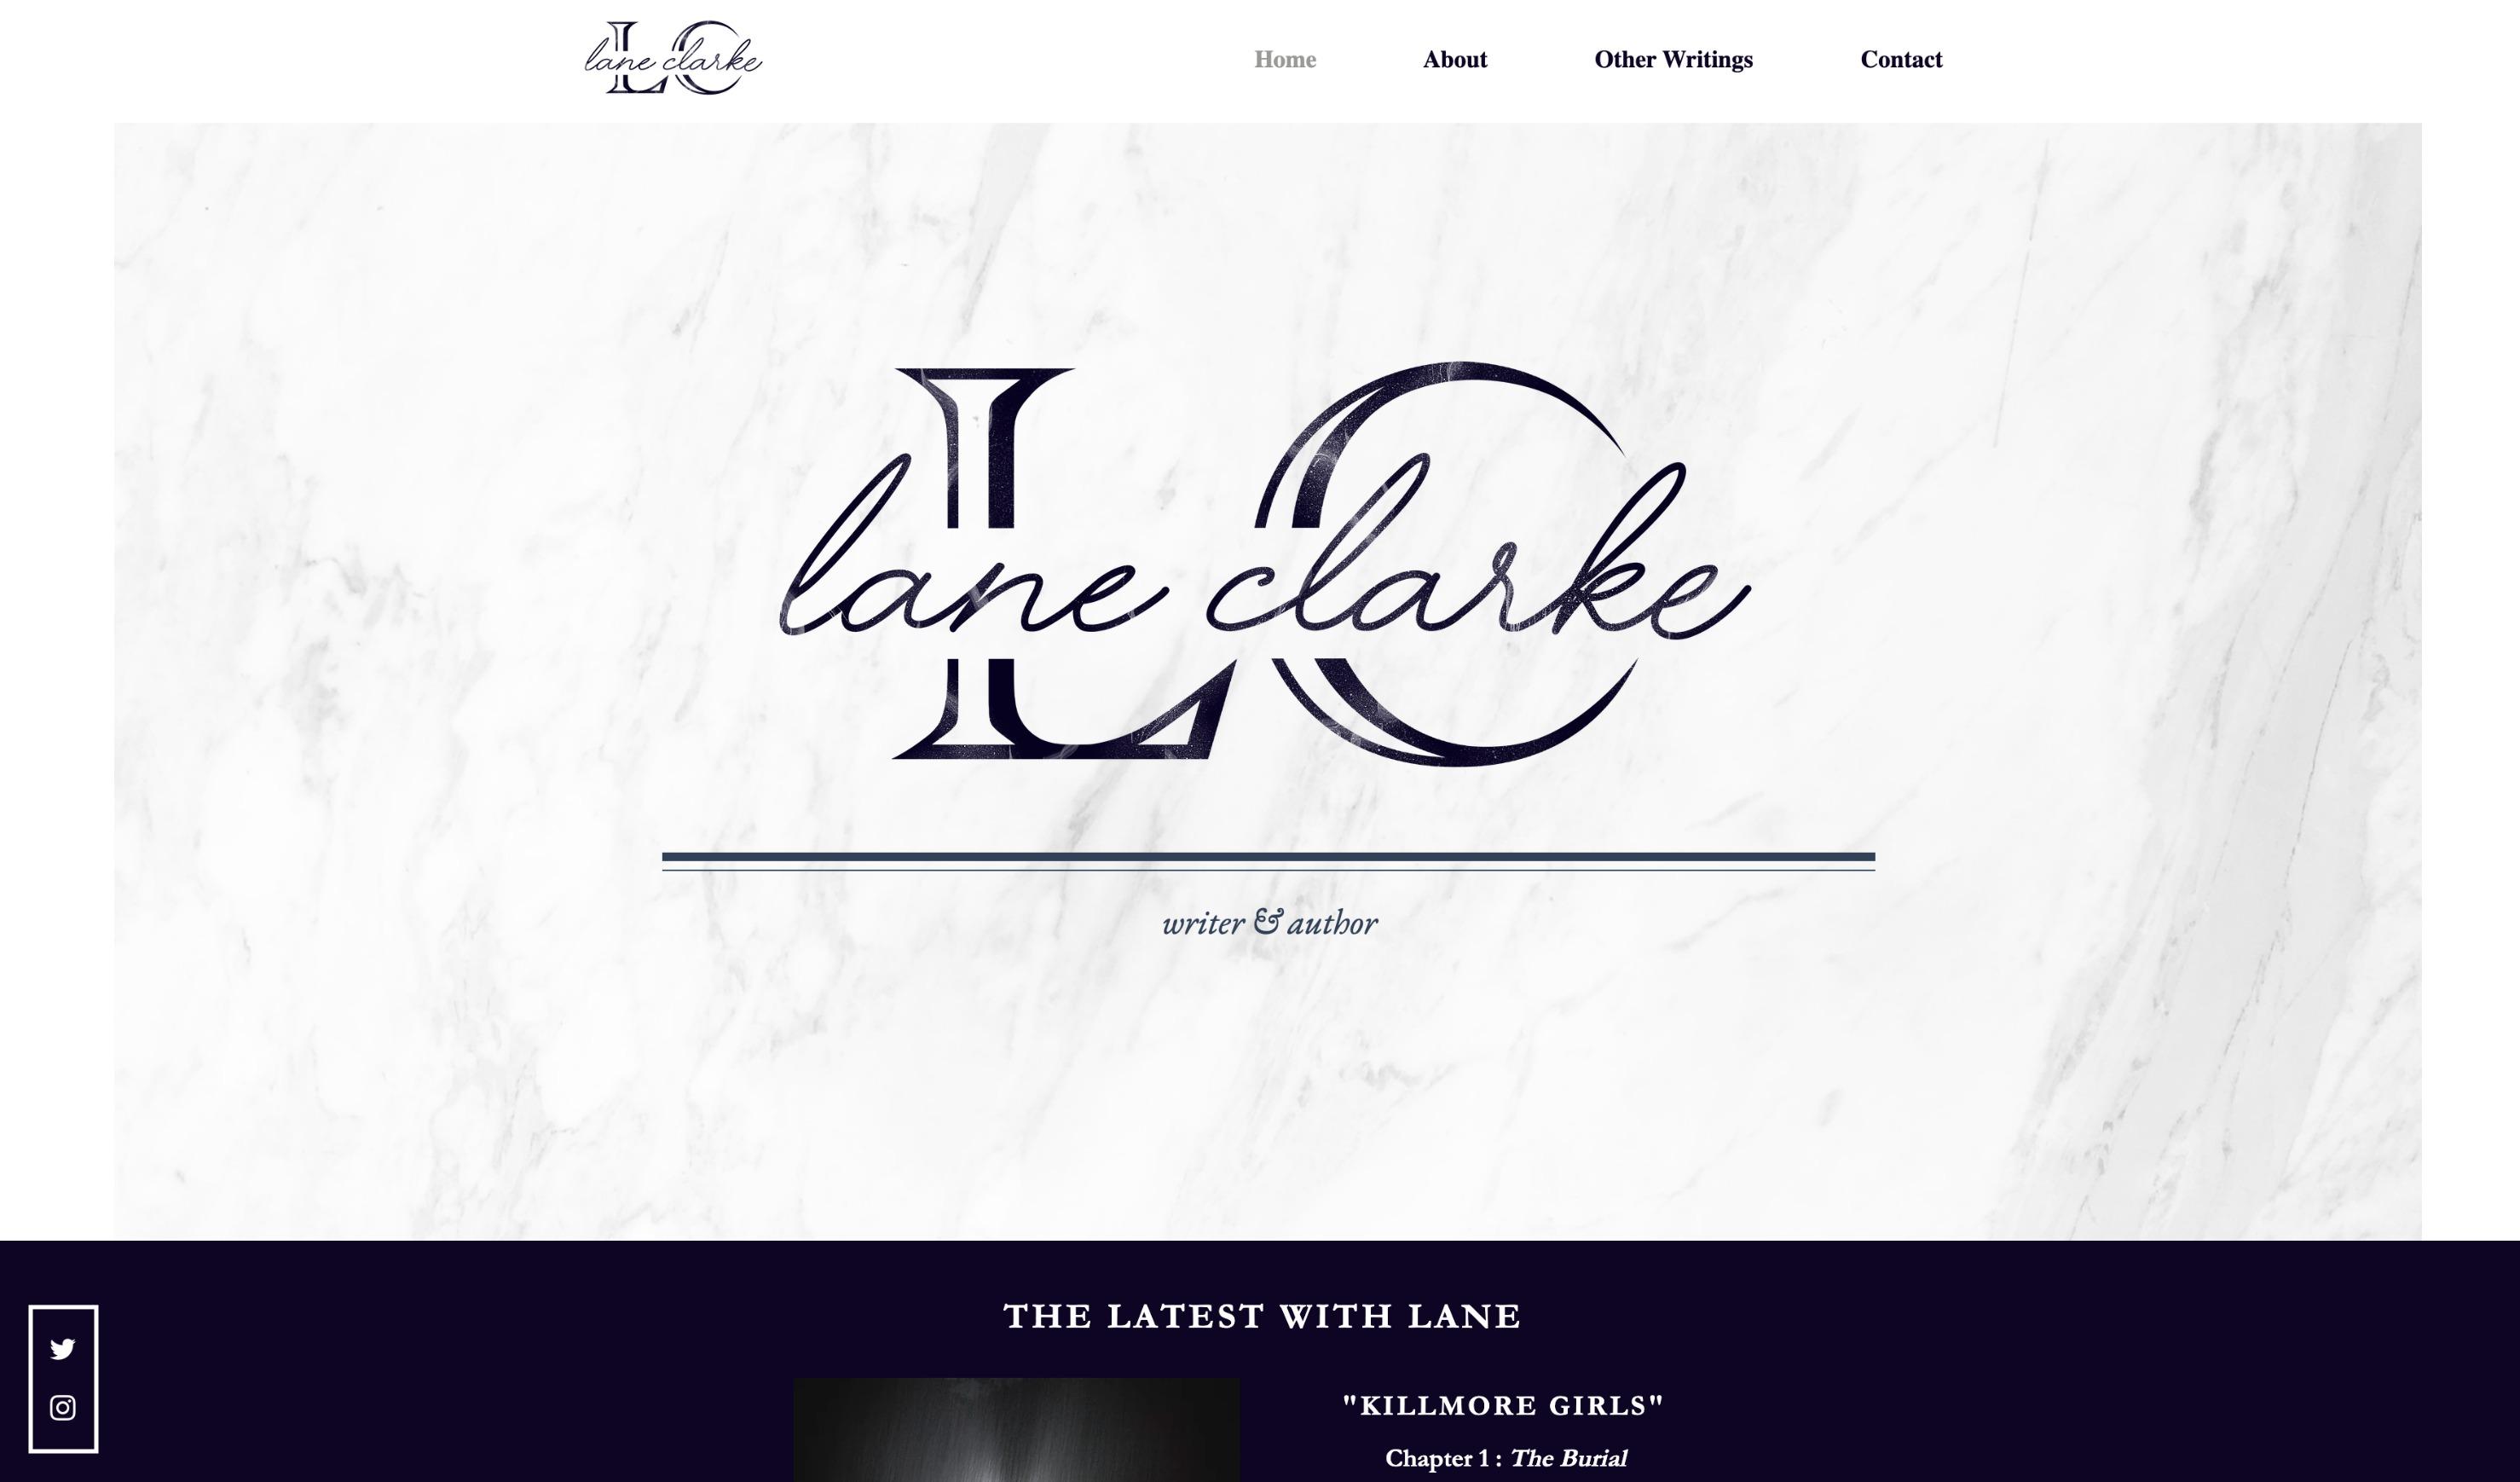 Lane Clarke